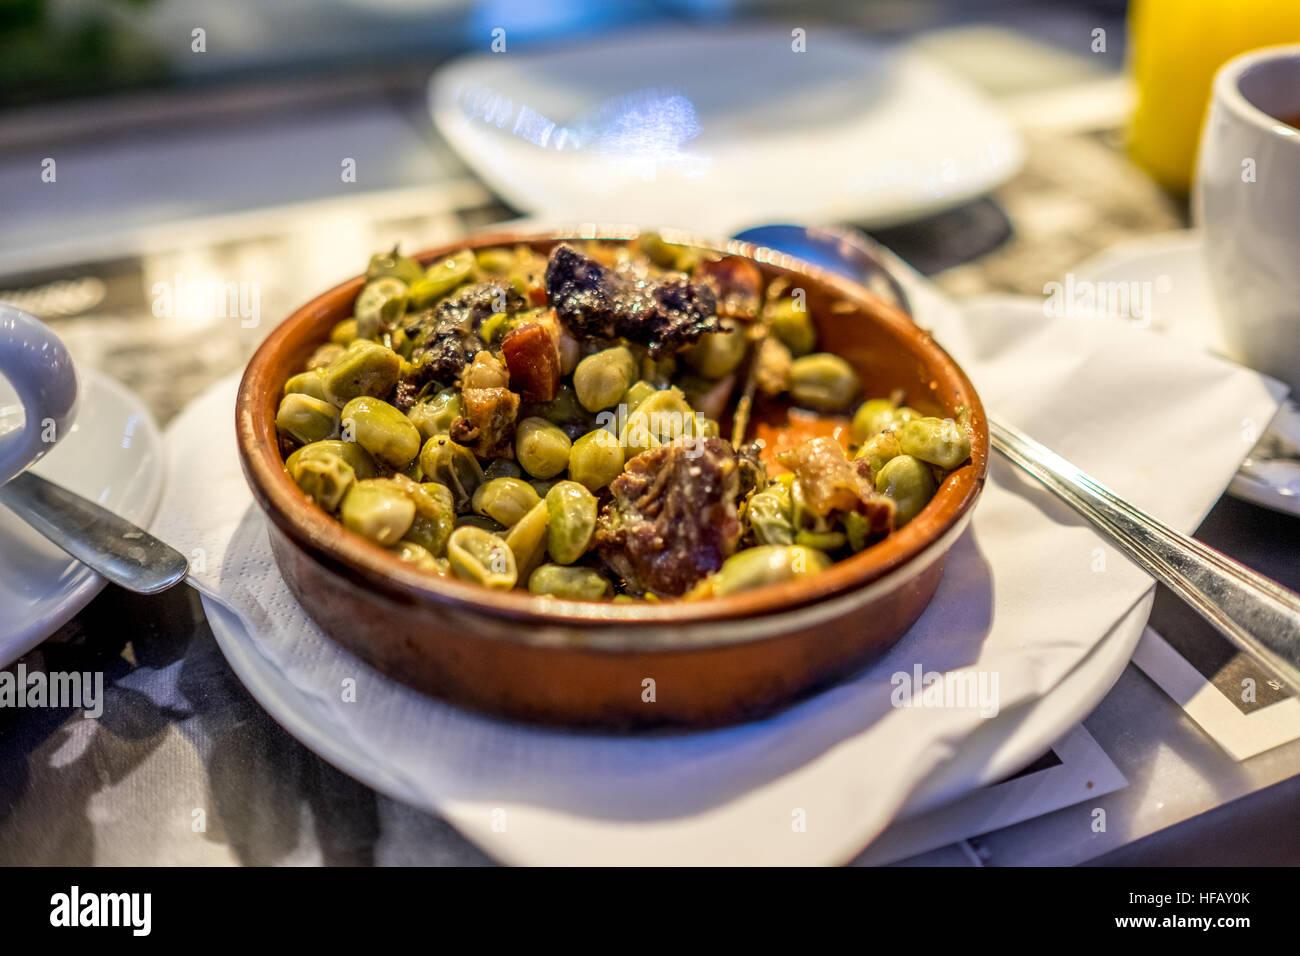 Spanish bean and sausage stew. - Stock Image